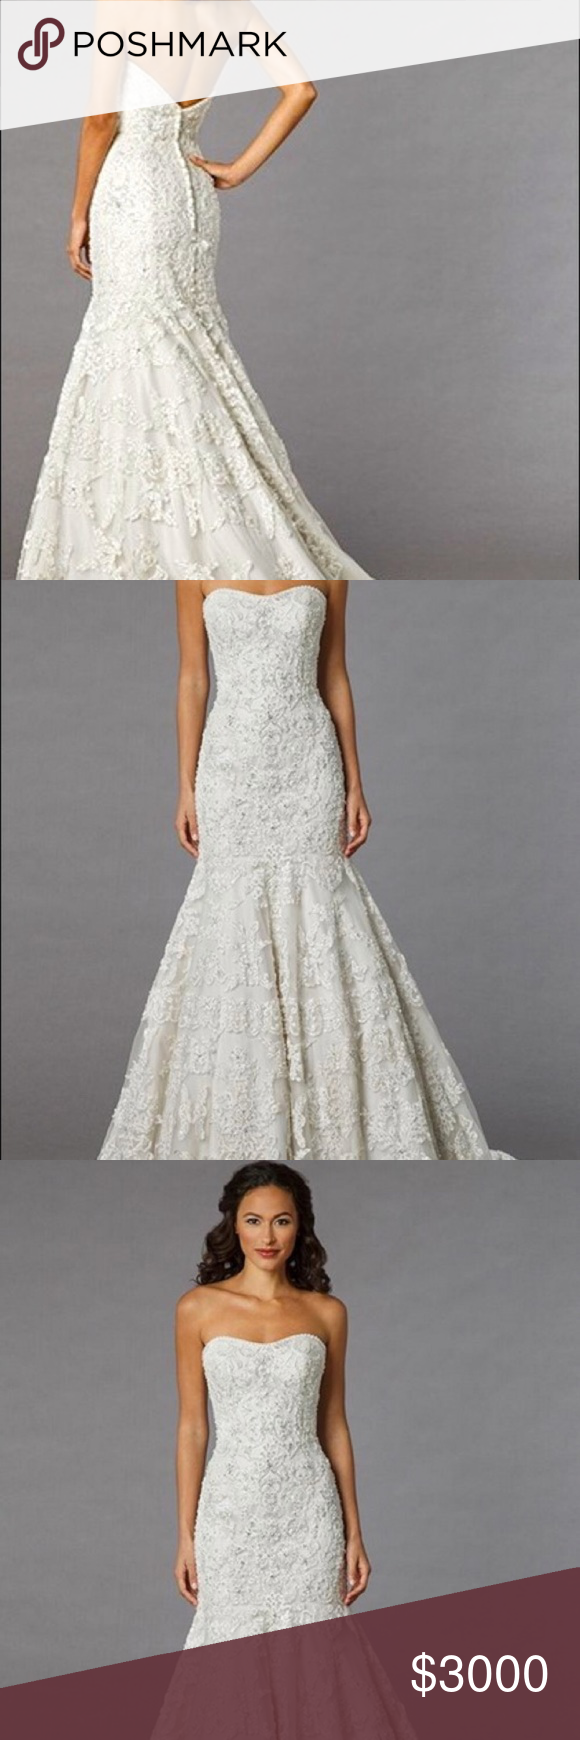 Kleinfeld danielle caprese beaded wedding dress beaded wedding